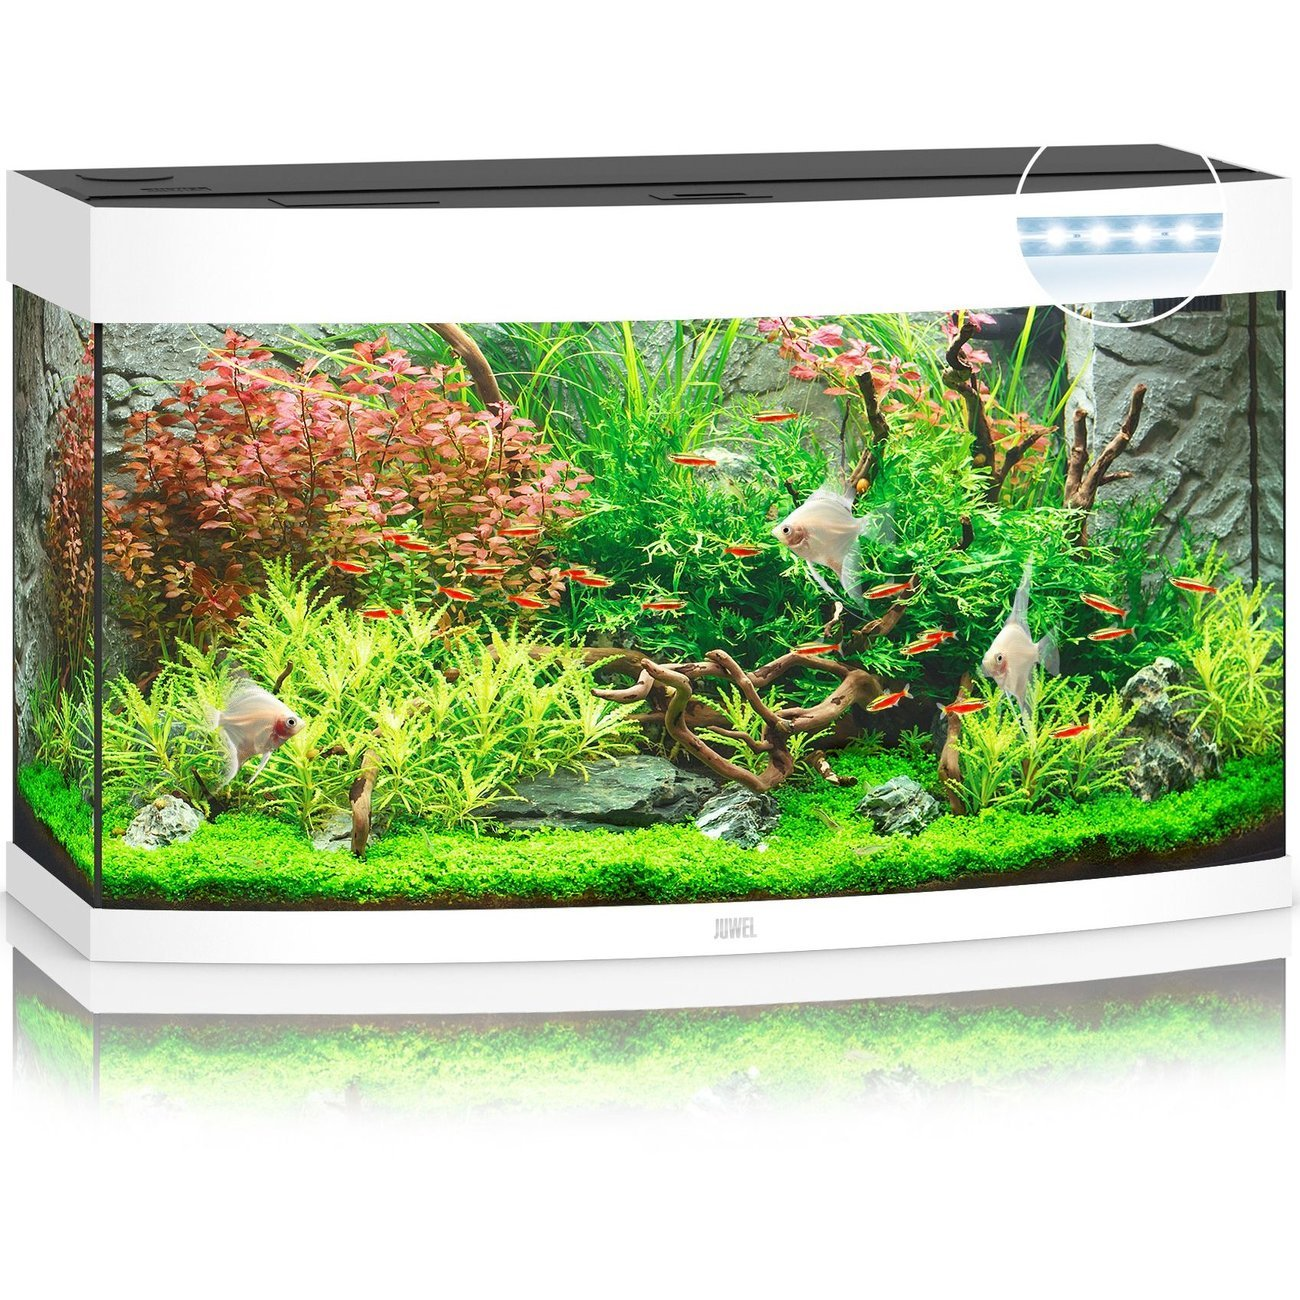 JUWEL Vision 180 LED Aquarium, 180 Liter, weiß